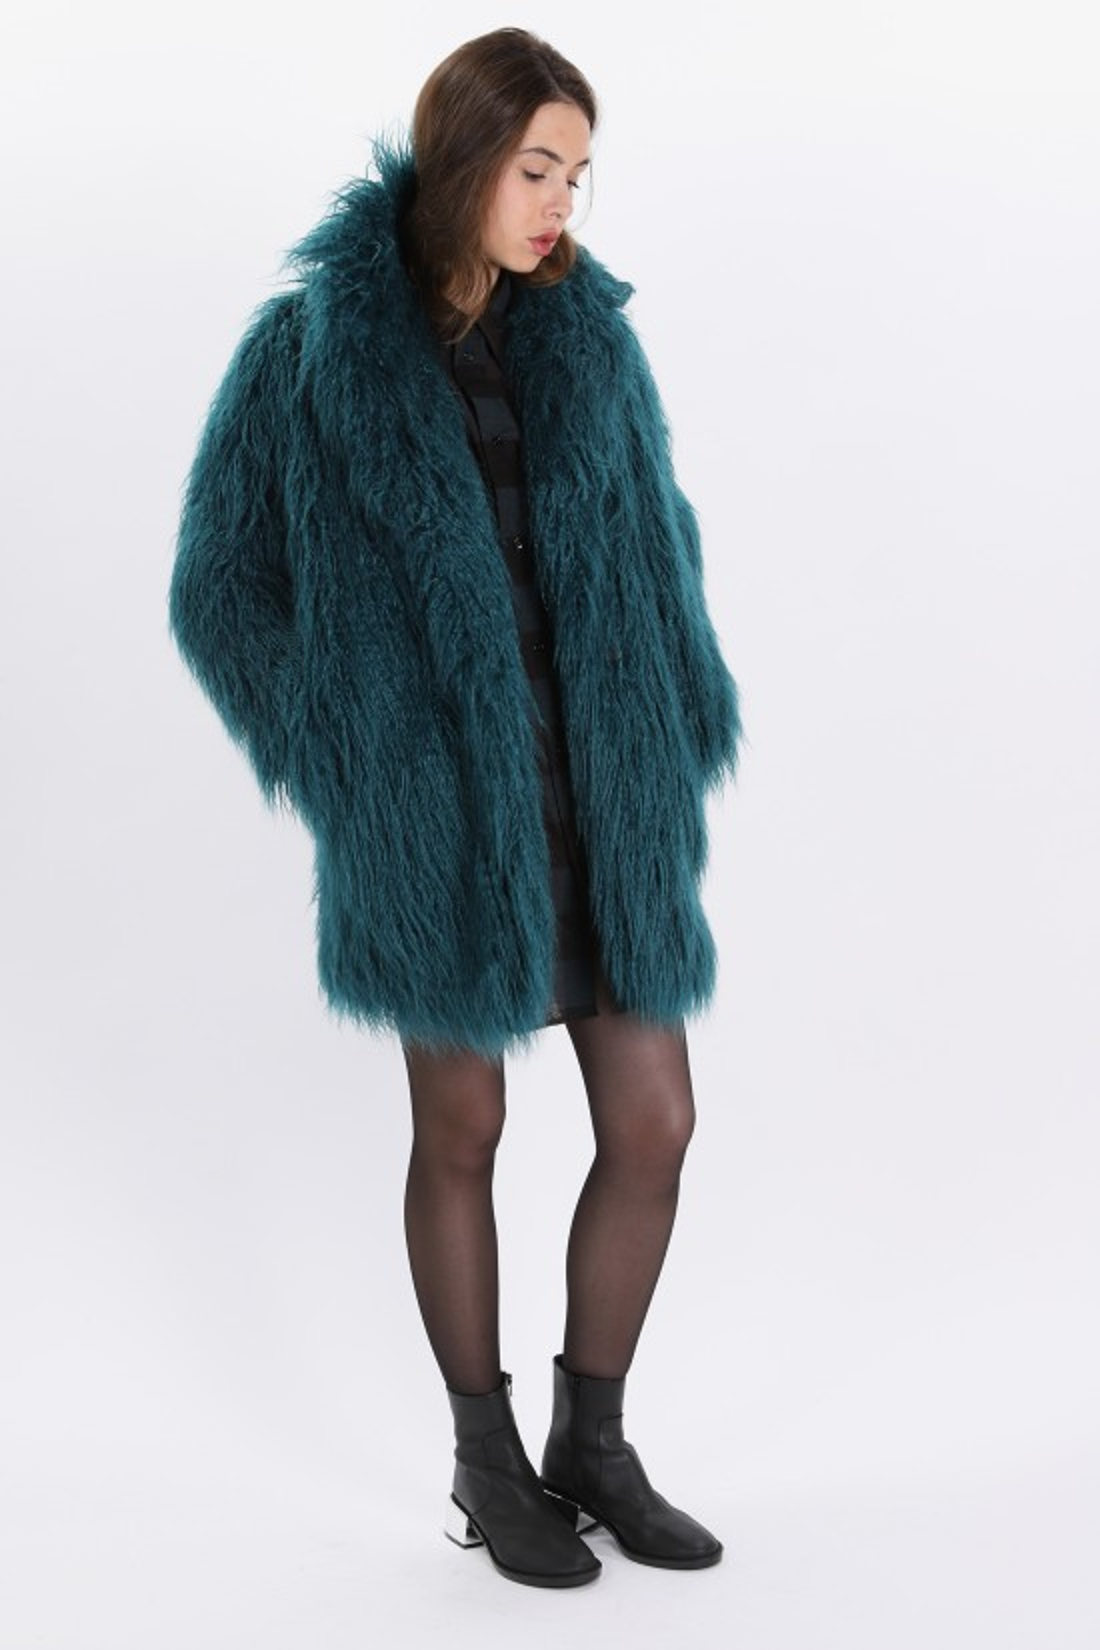 MM6 MAISON MARGIELA / Long hair coat Green